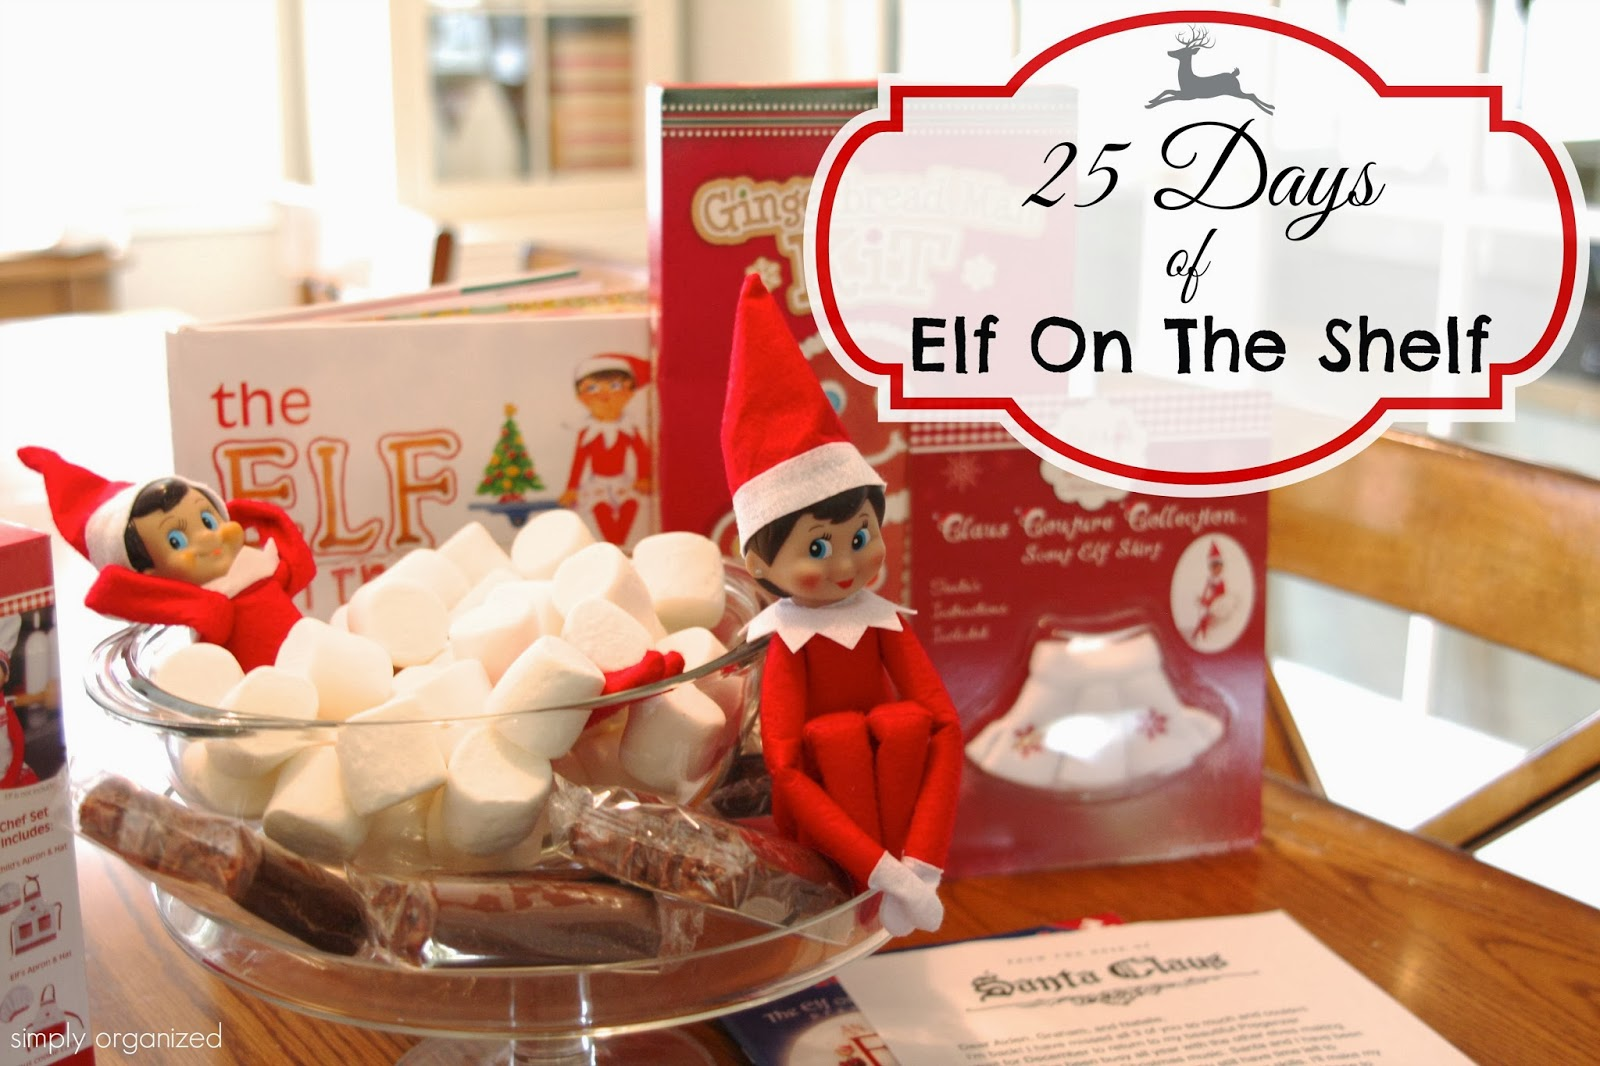 simply organized: 25 Days of Elf On The Shelf! v.2013